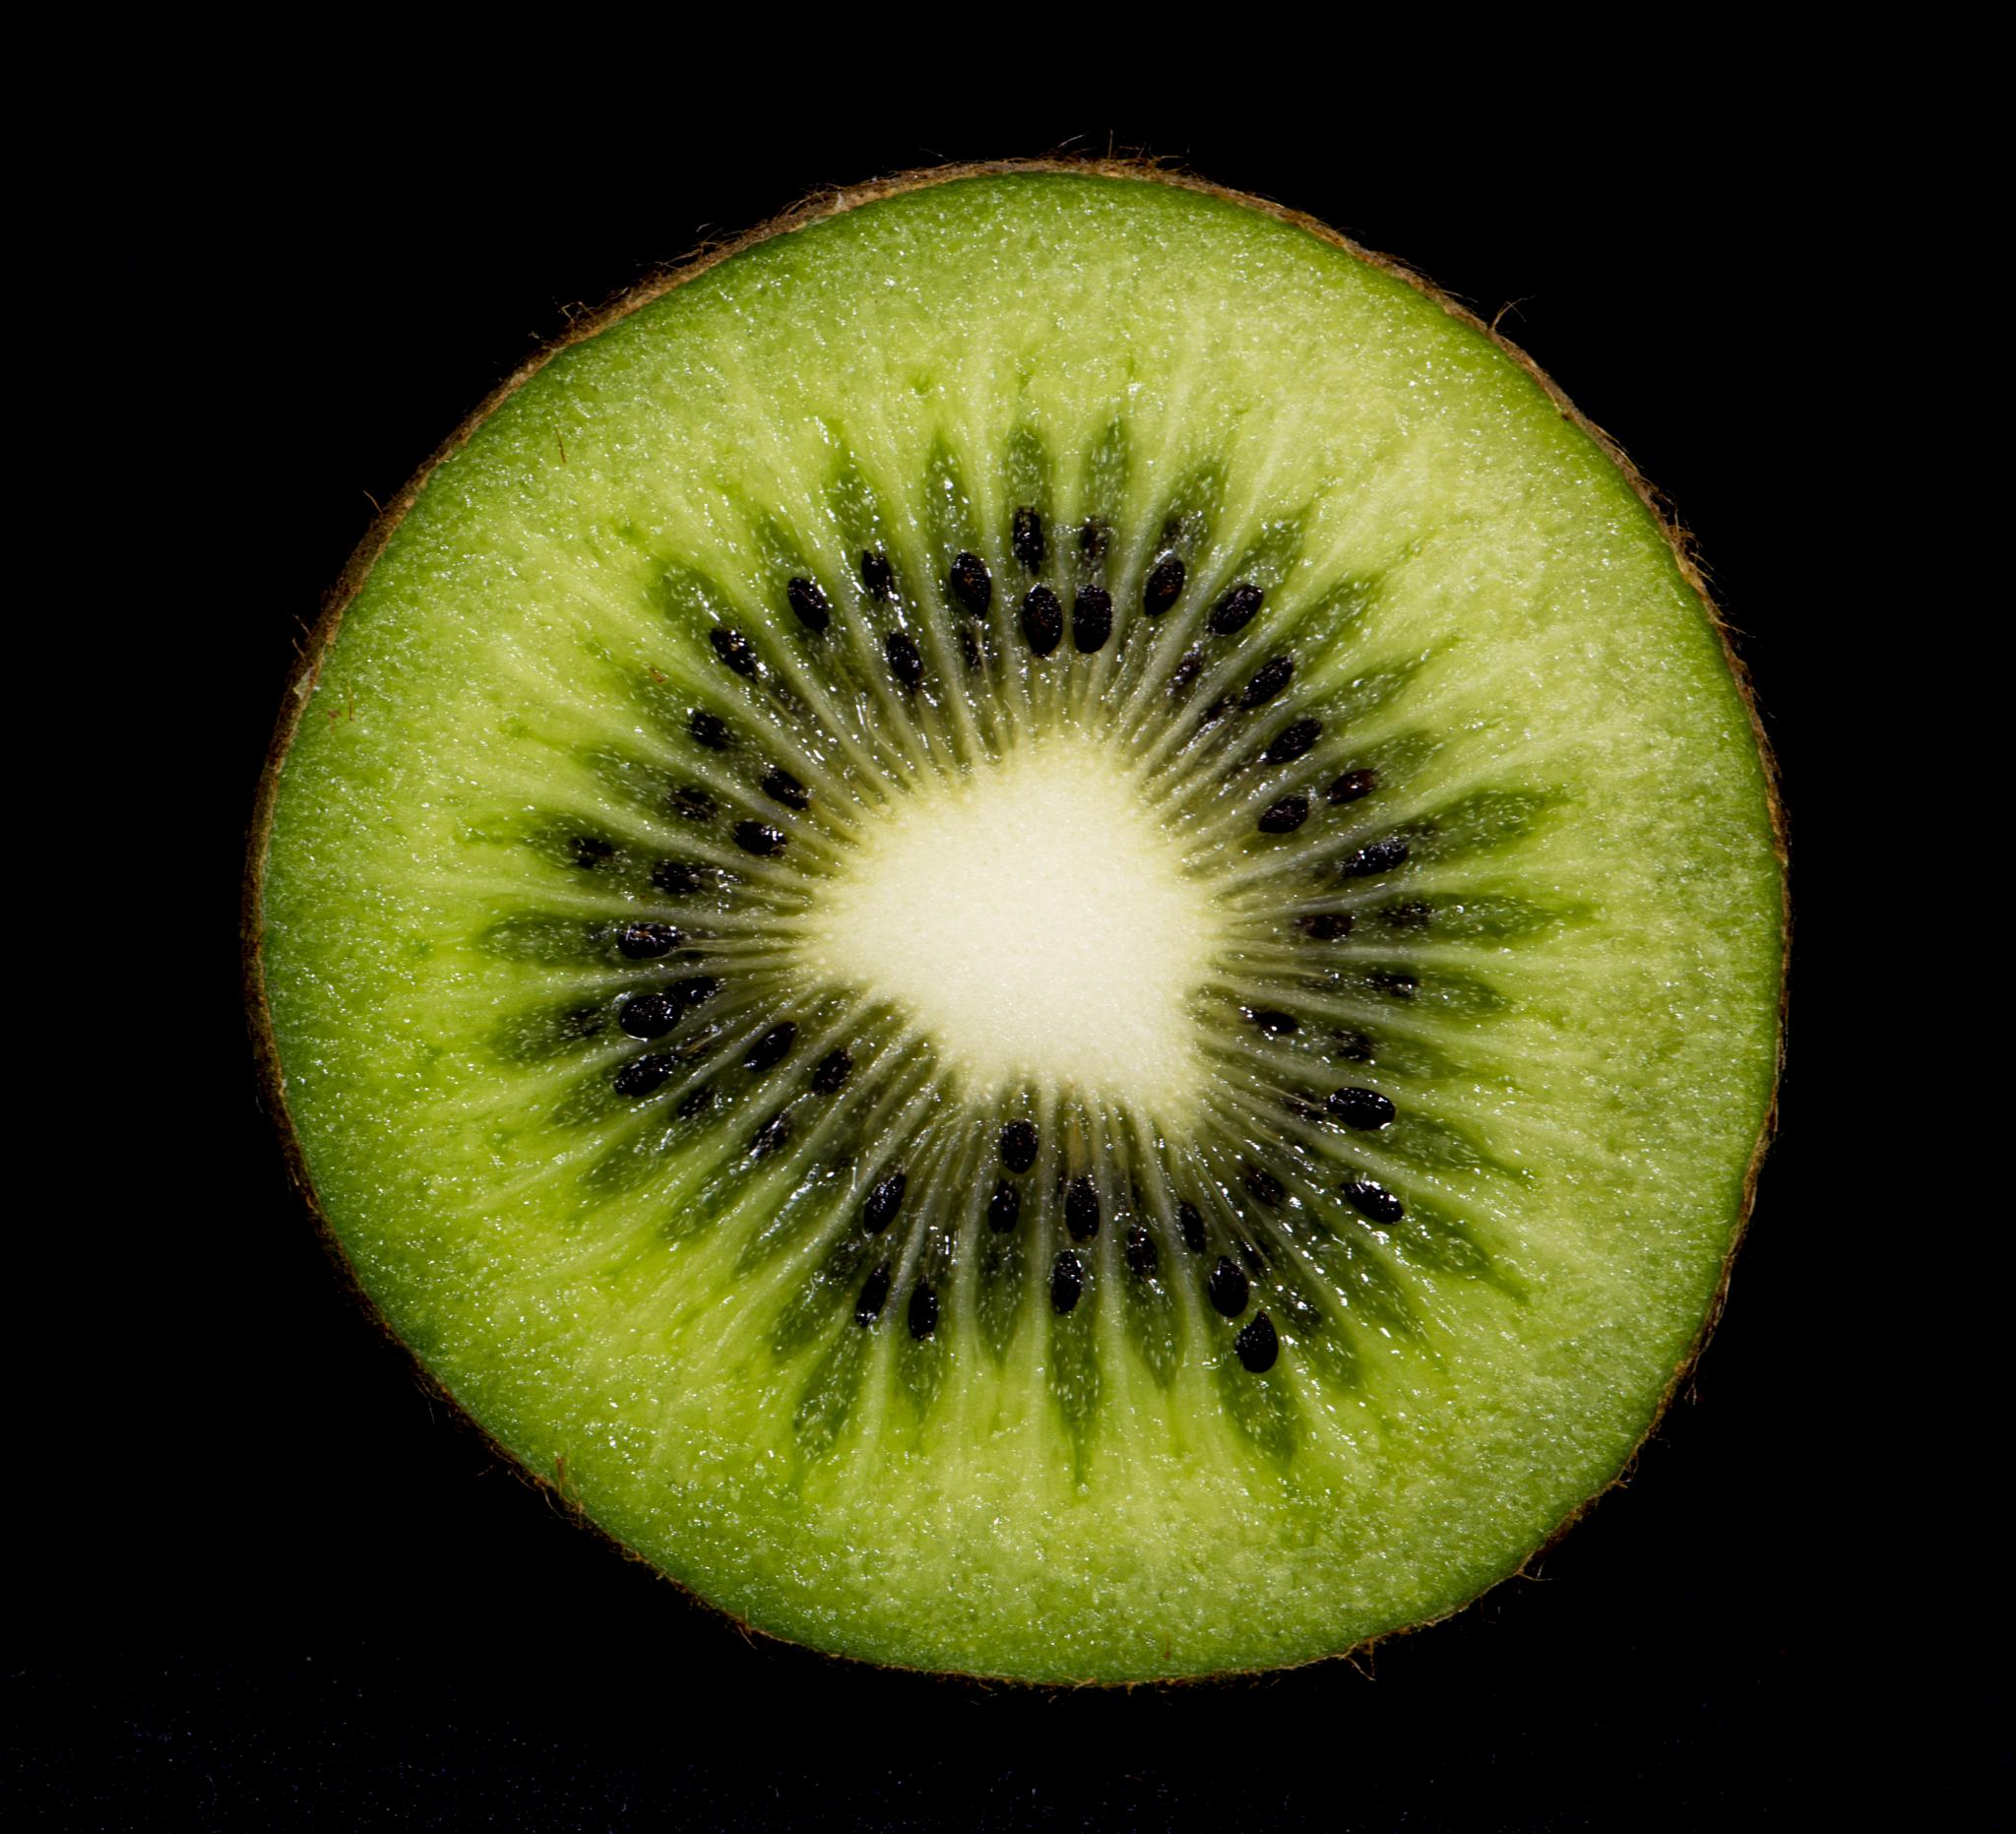 Kiwi-Makro by Albert H. Wegmann